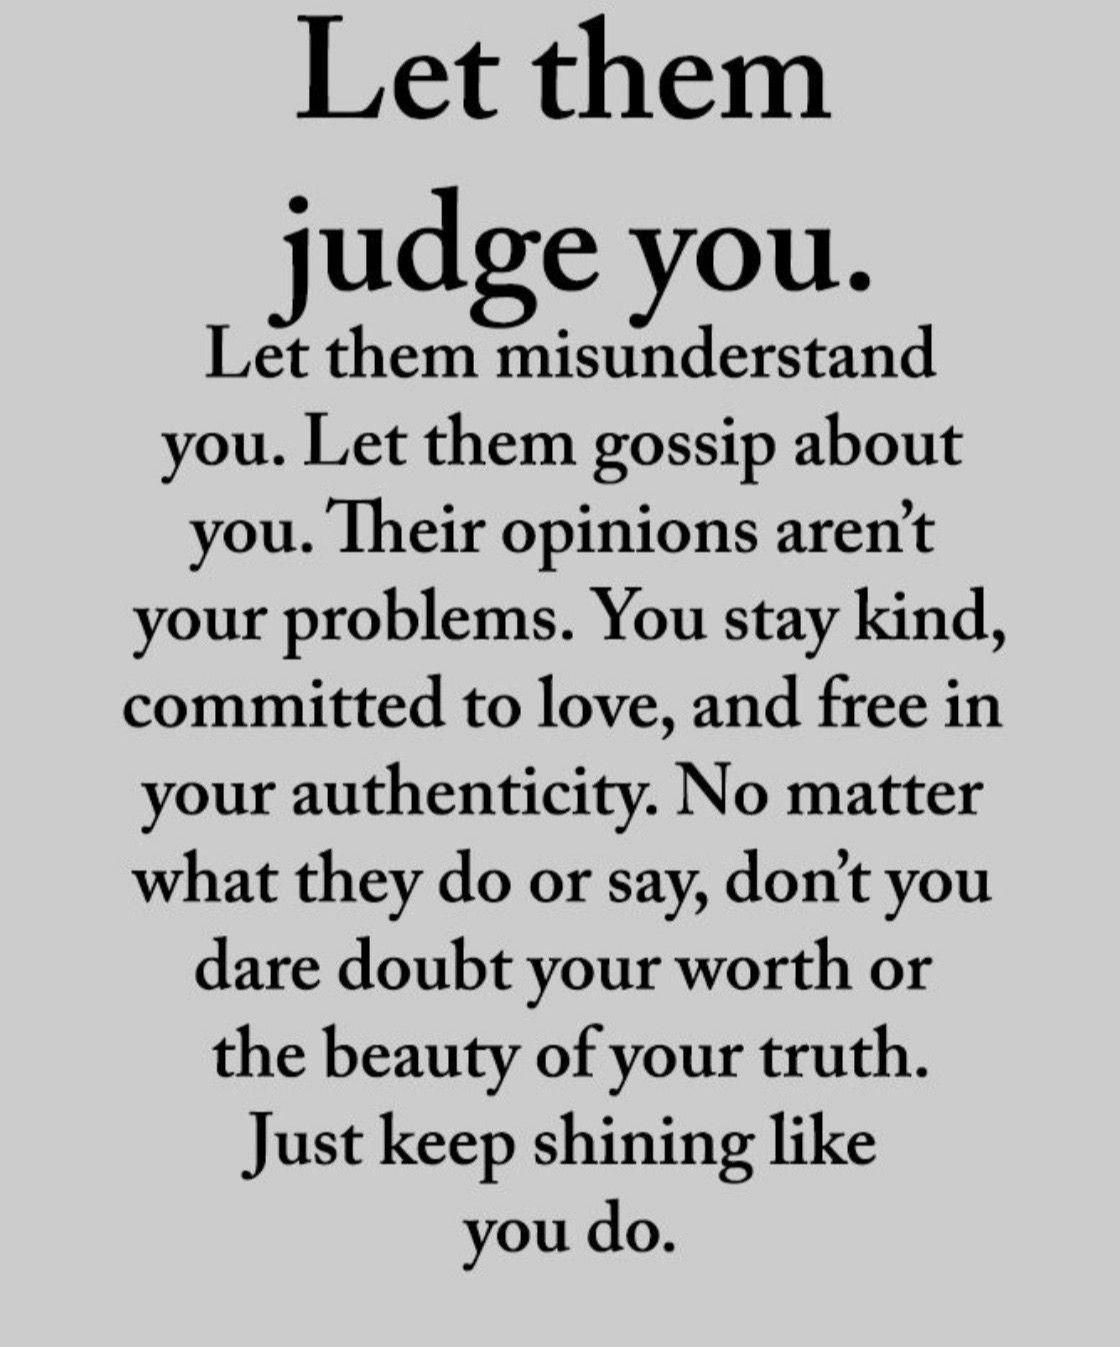 Let Them Judge You Let Them Misunderstand You Let Them